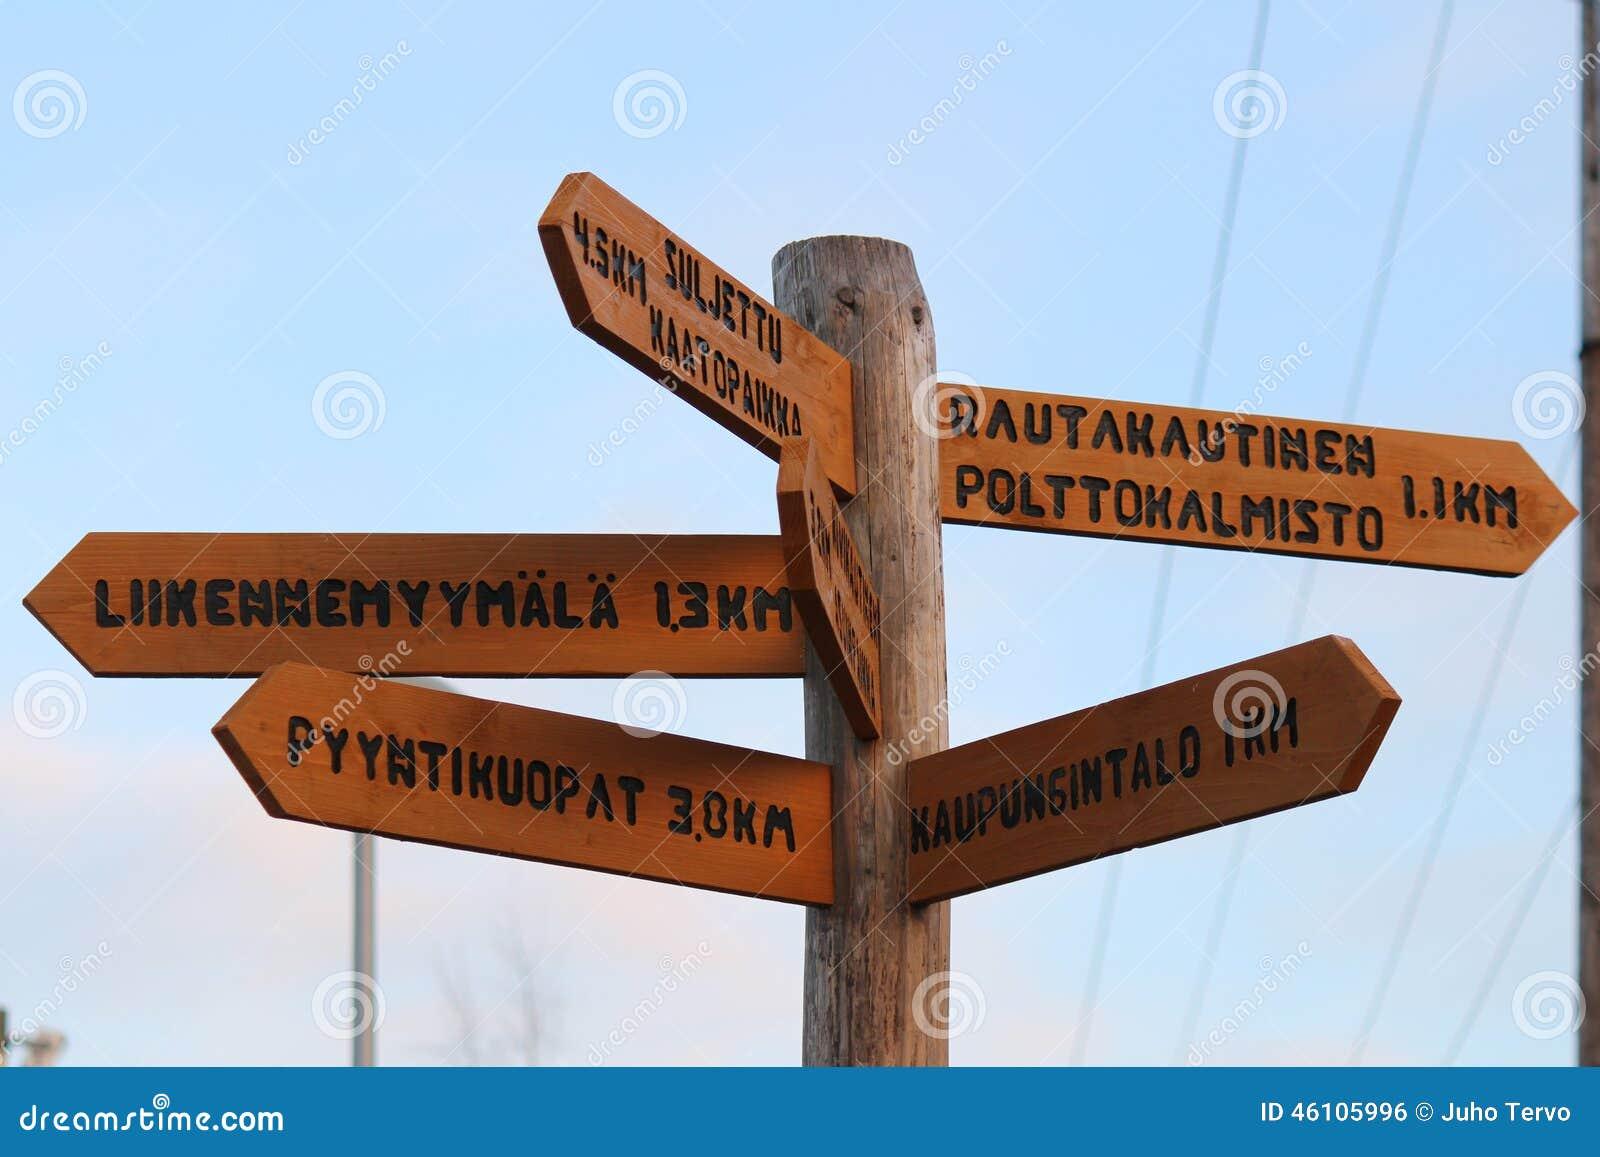 Crossroads Sign in Akaa, Finland